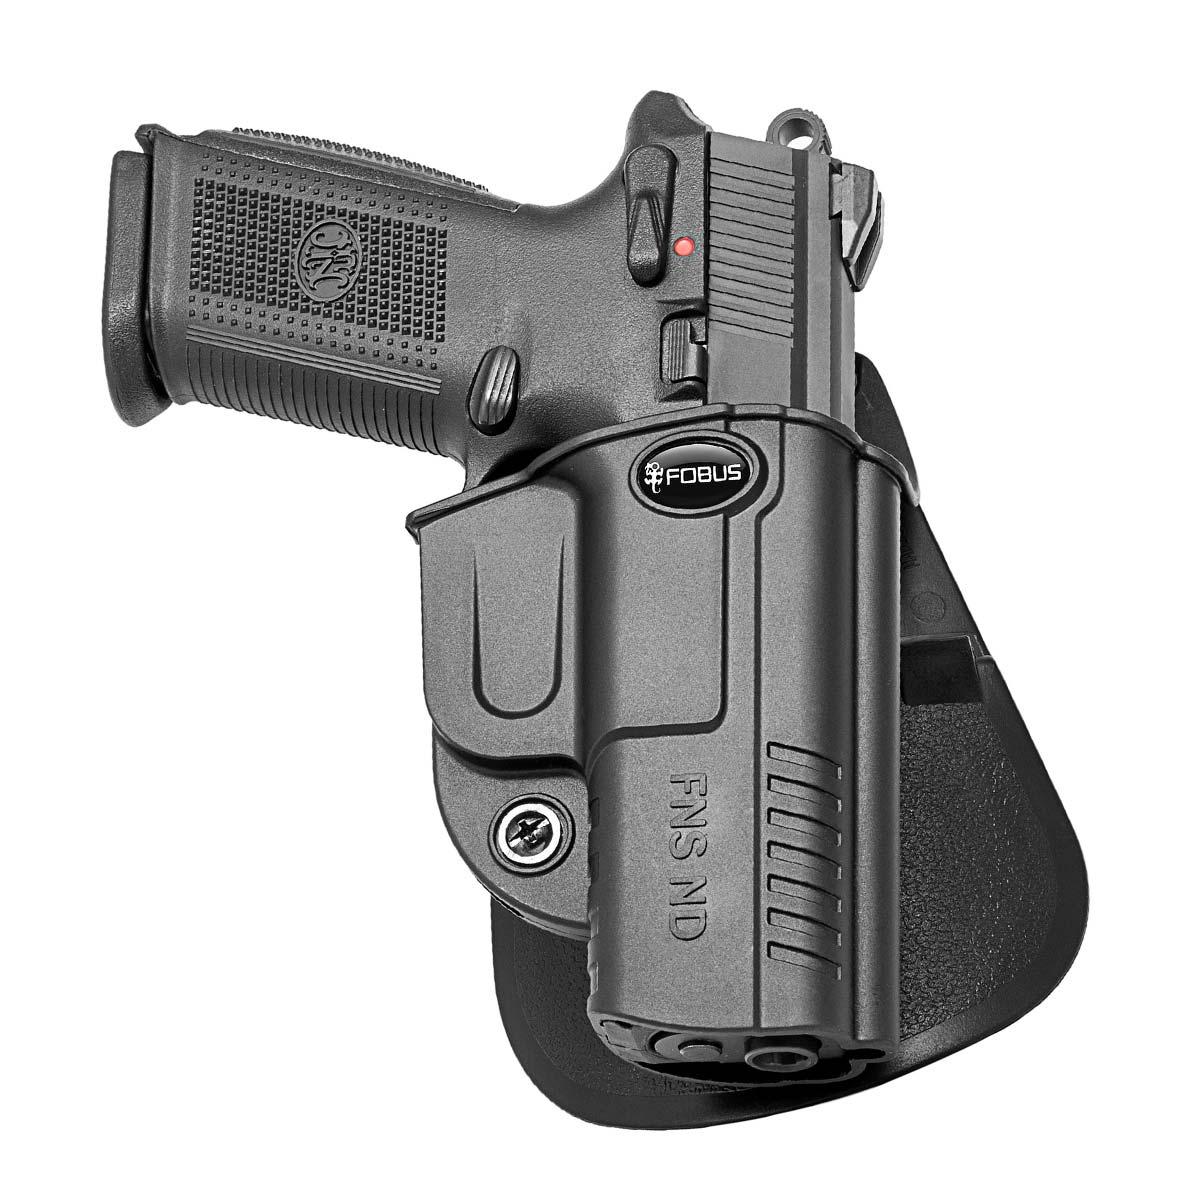 Fobus FN FNS-9 Full-Size Holster (ND)